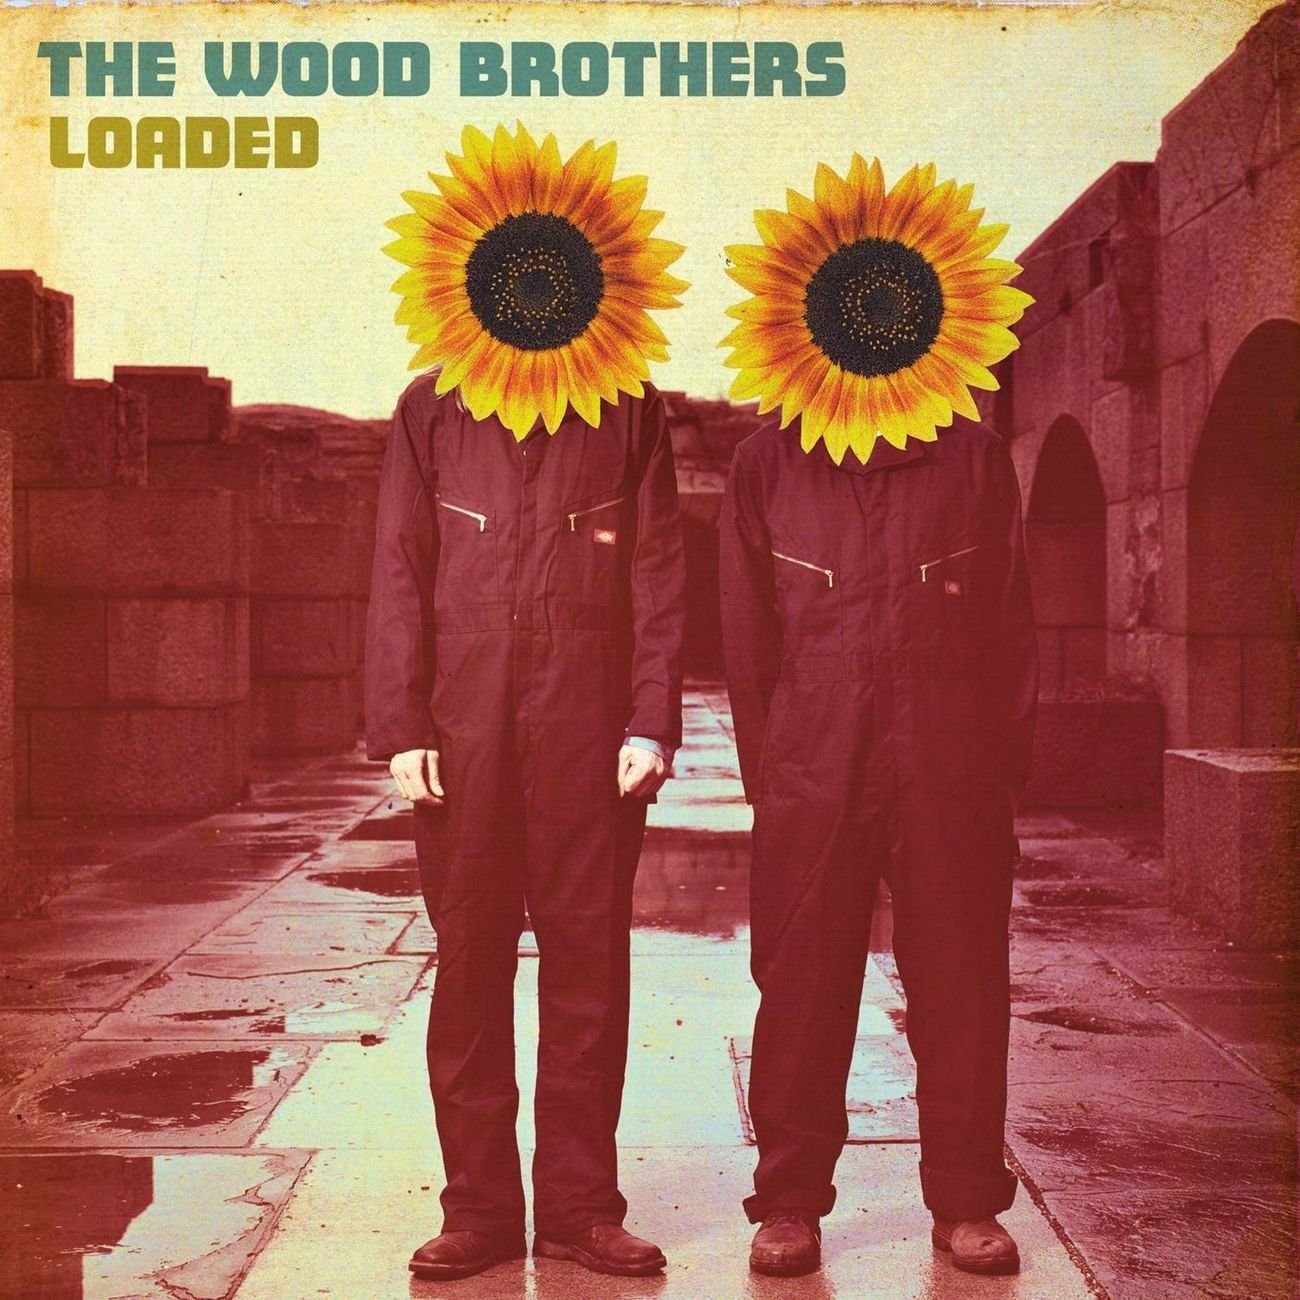 loaded%2Bwood%2Bbrothers.jpg